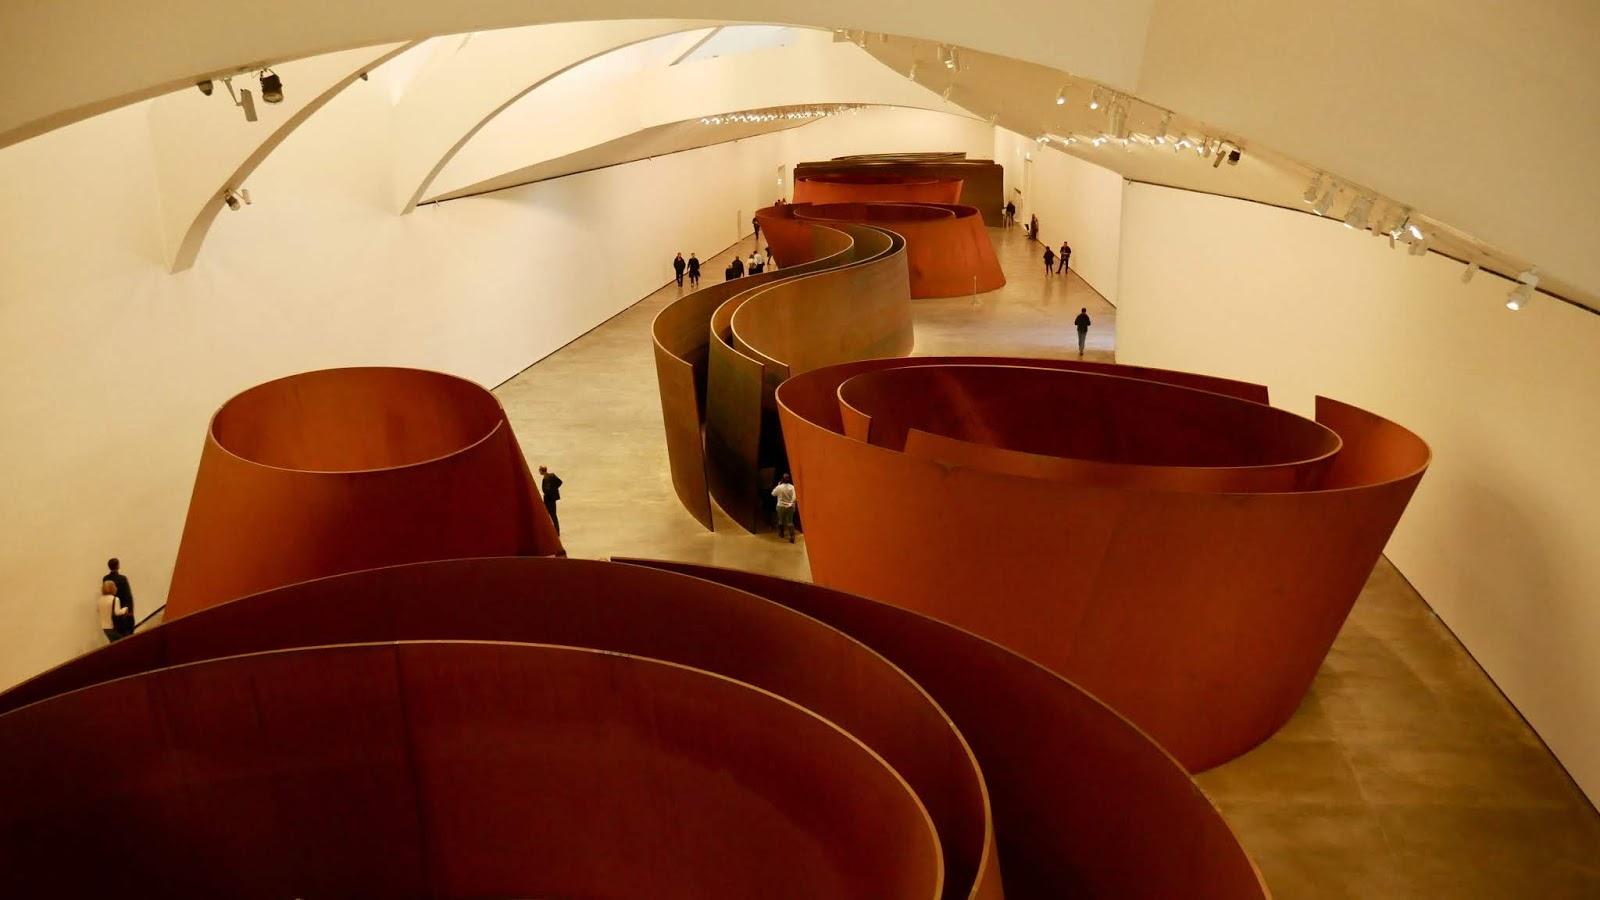 Richard Serra Musée Guggenheim Bilbao Pays Basque Espagne